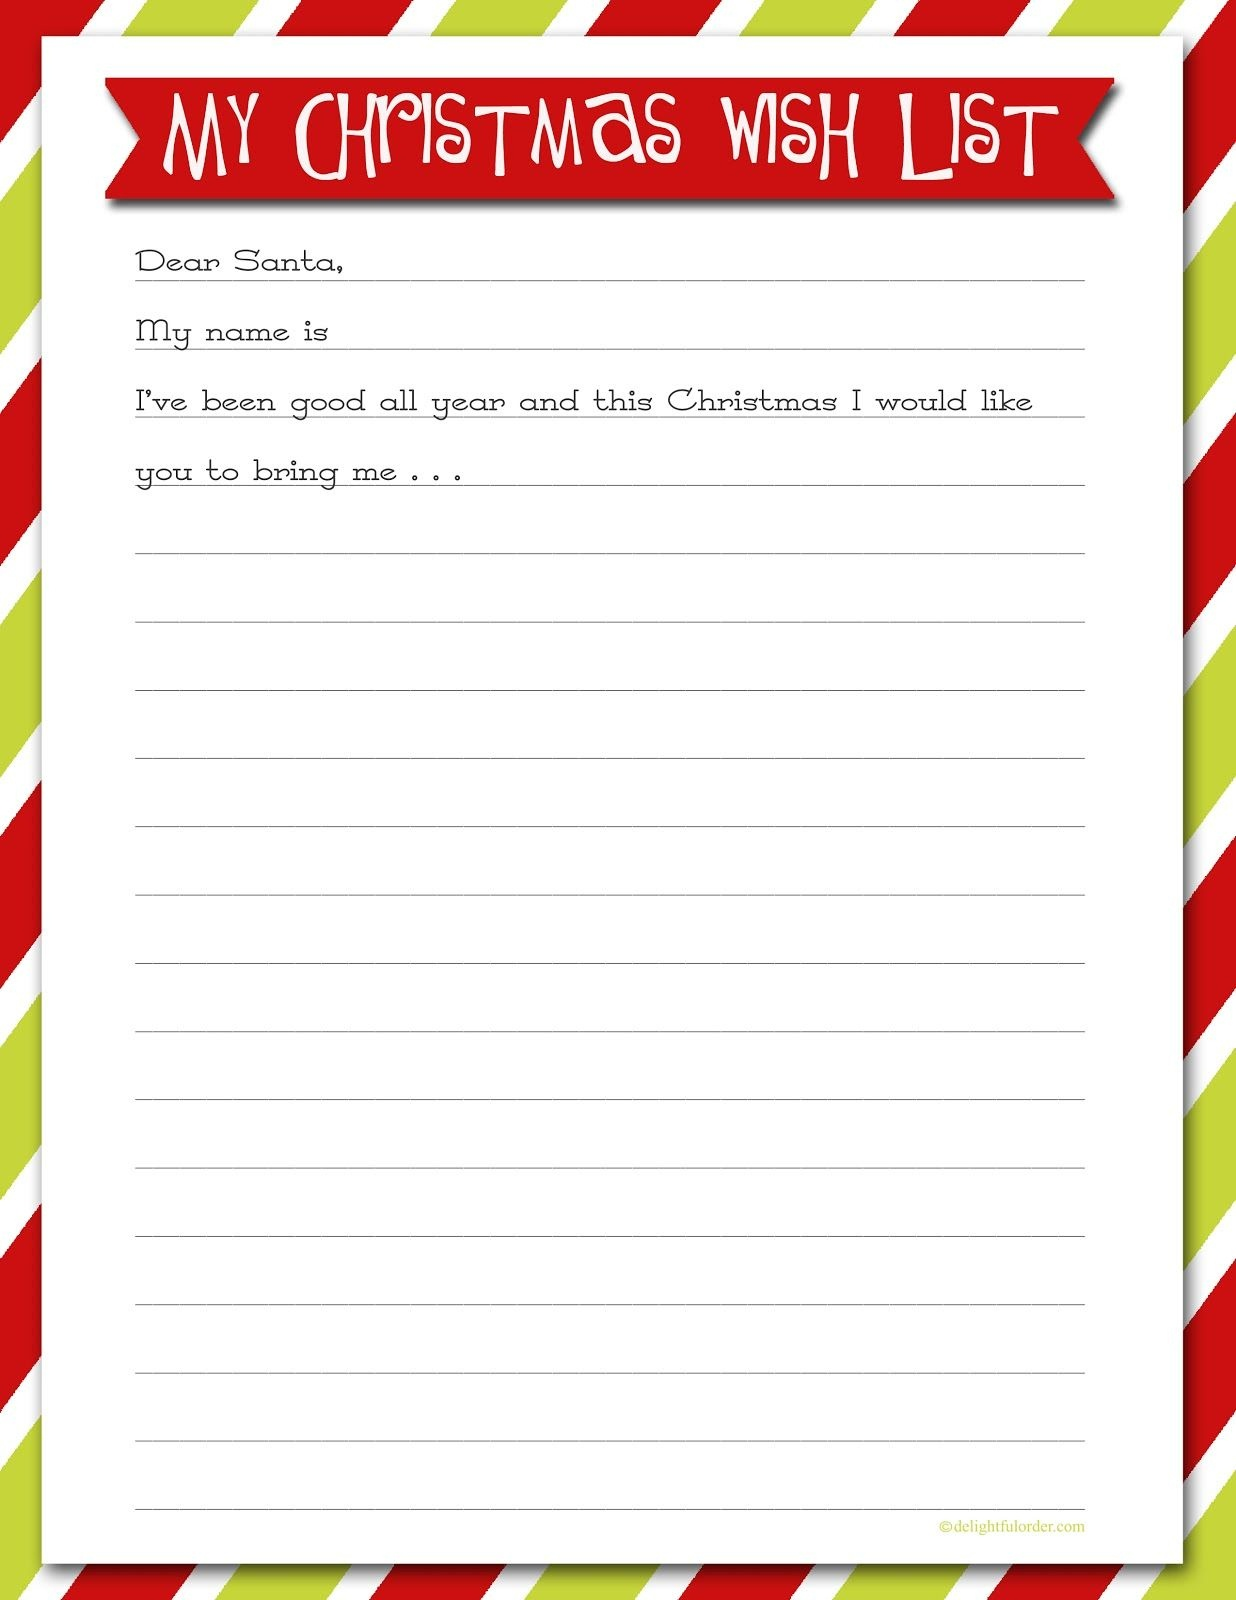 Delightful Order: Christmas Wish List - Free Printable   Delightful - Free Printable Christmas List Maker